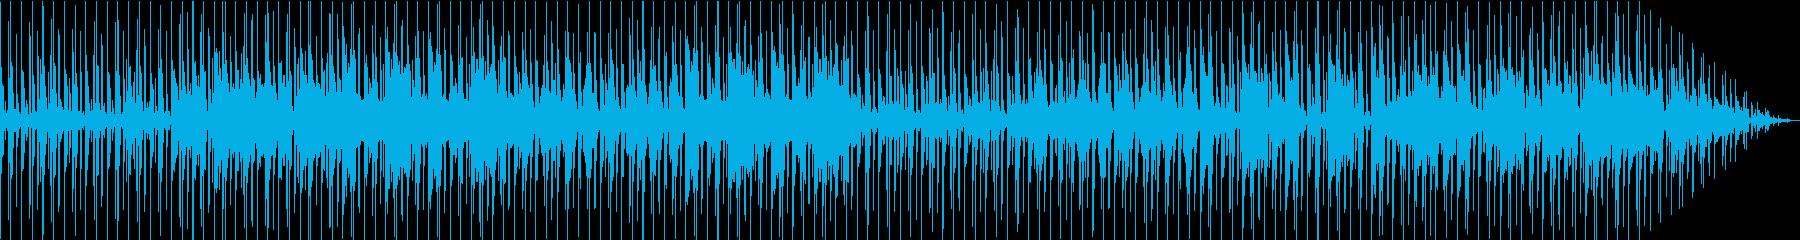 cyber danceの再生済みの波形